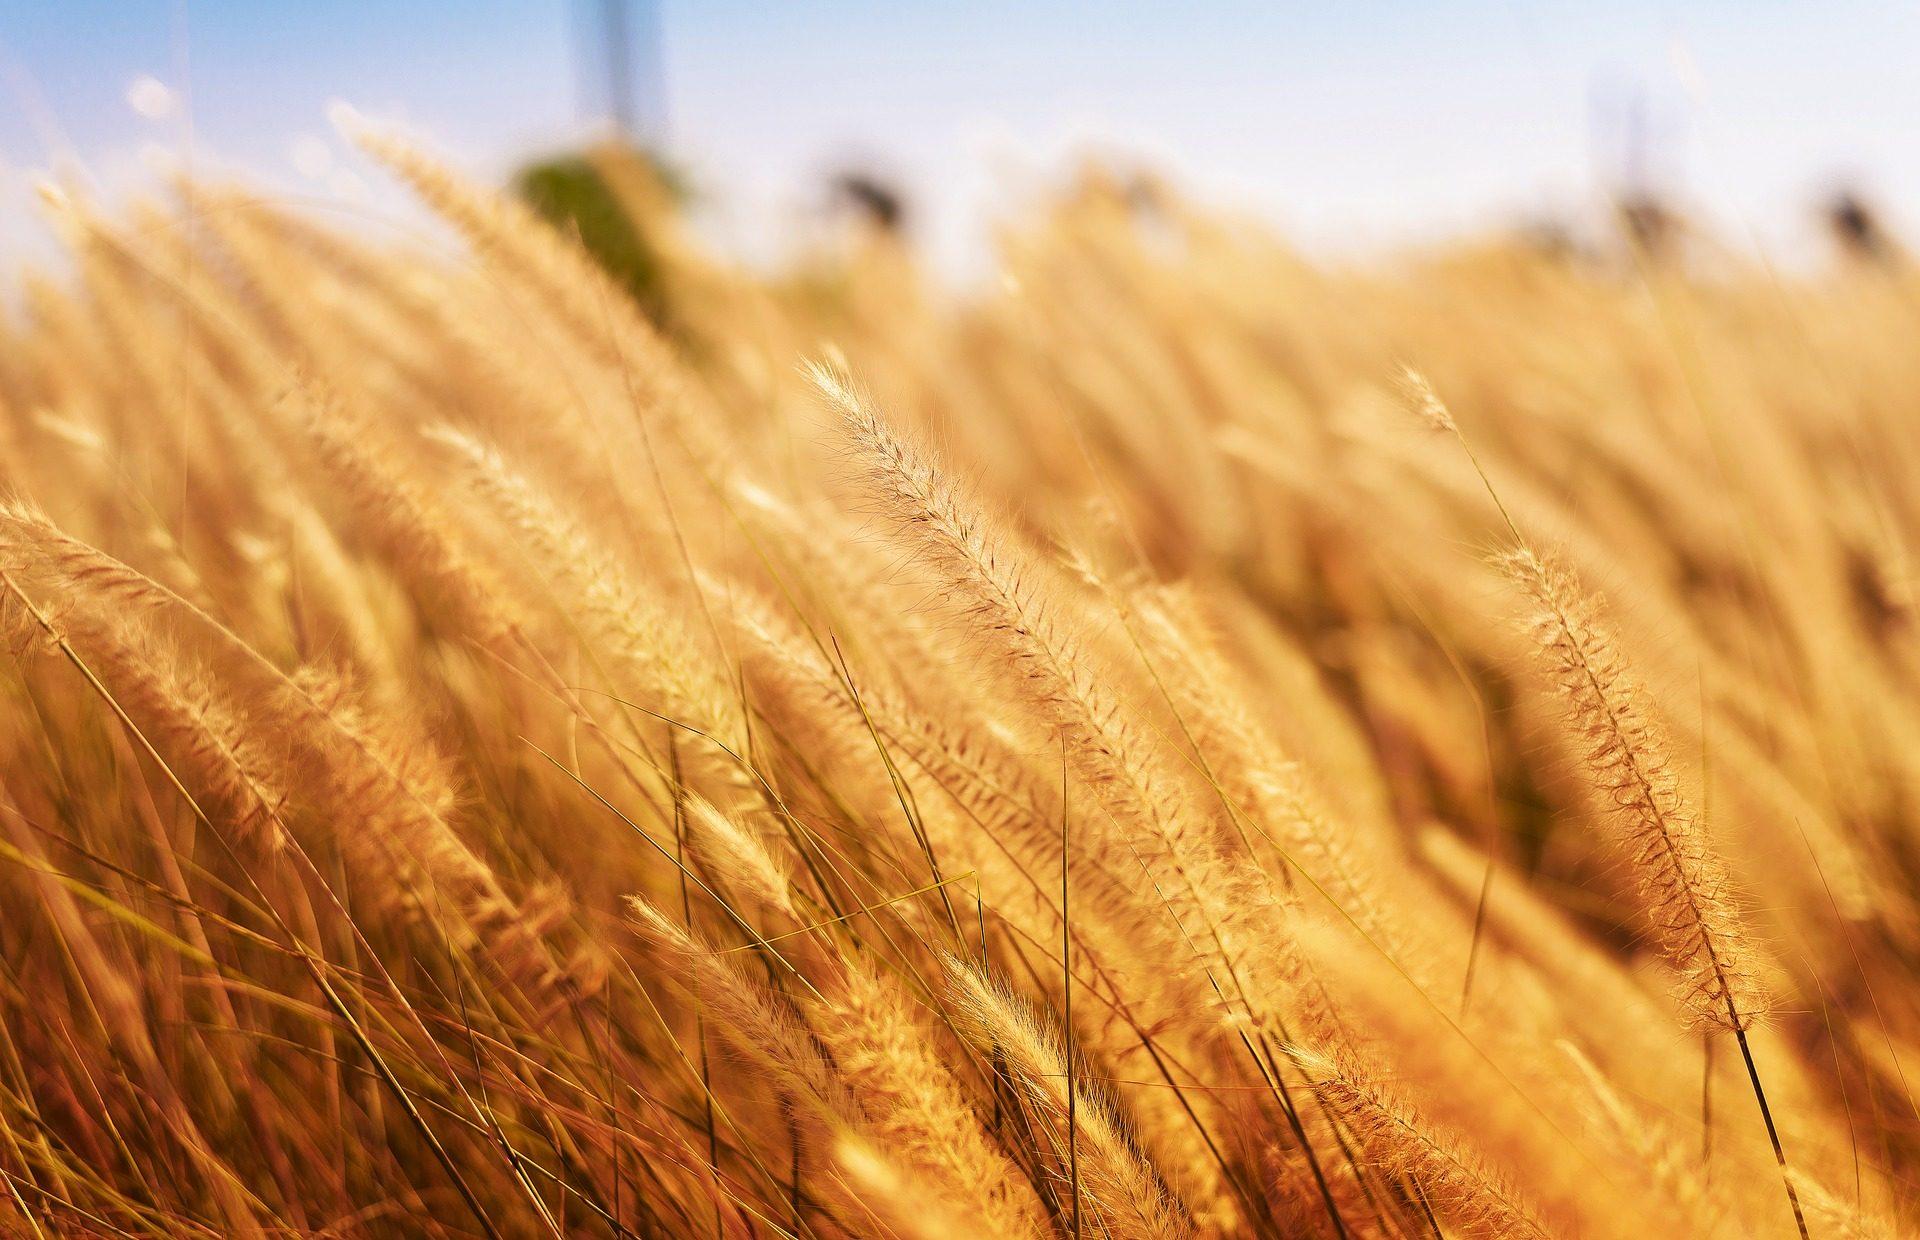 trigo, plantación, cultivo, granja, agricultura - Fondos de Pantalla HD - professor-falken.com